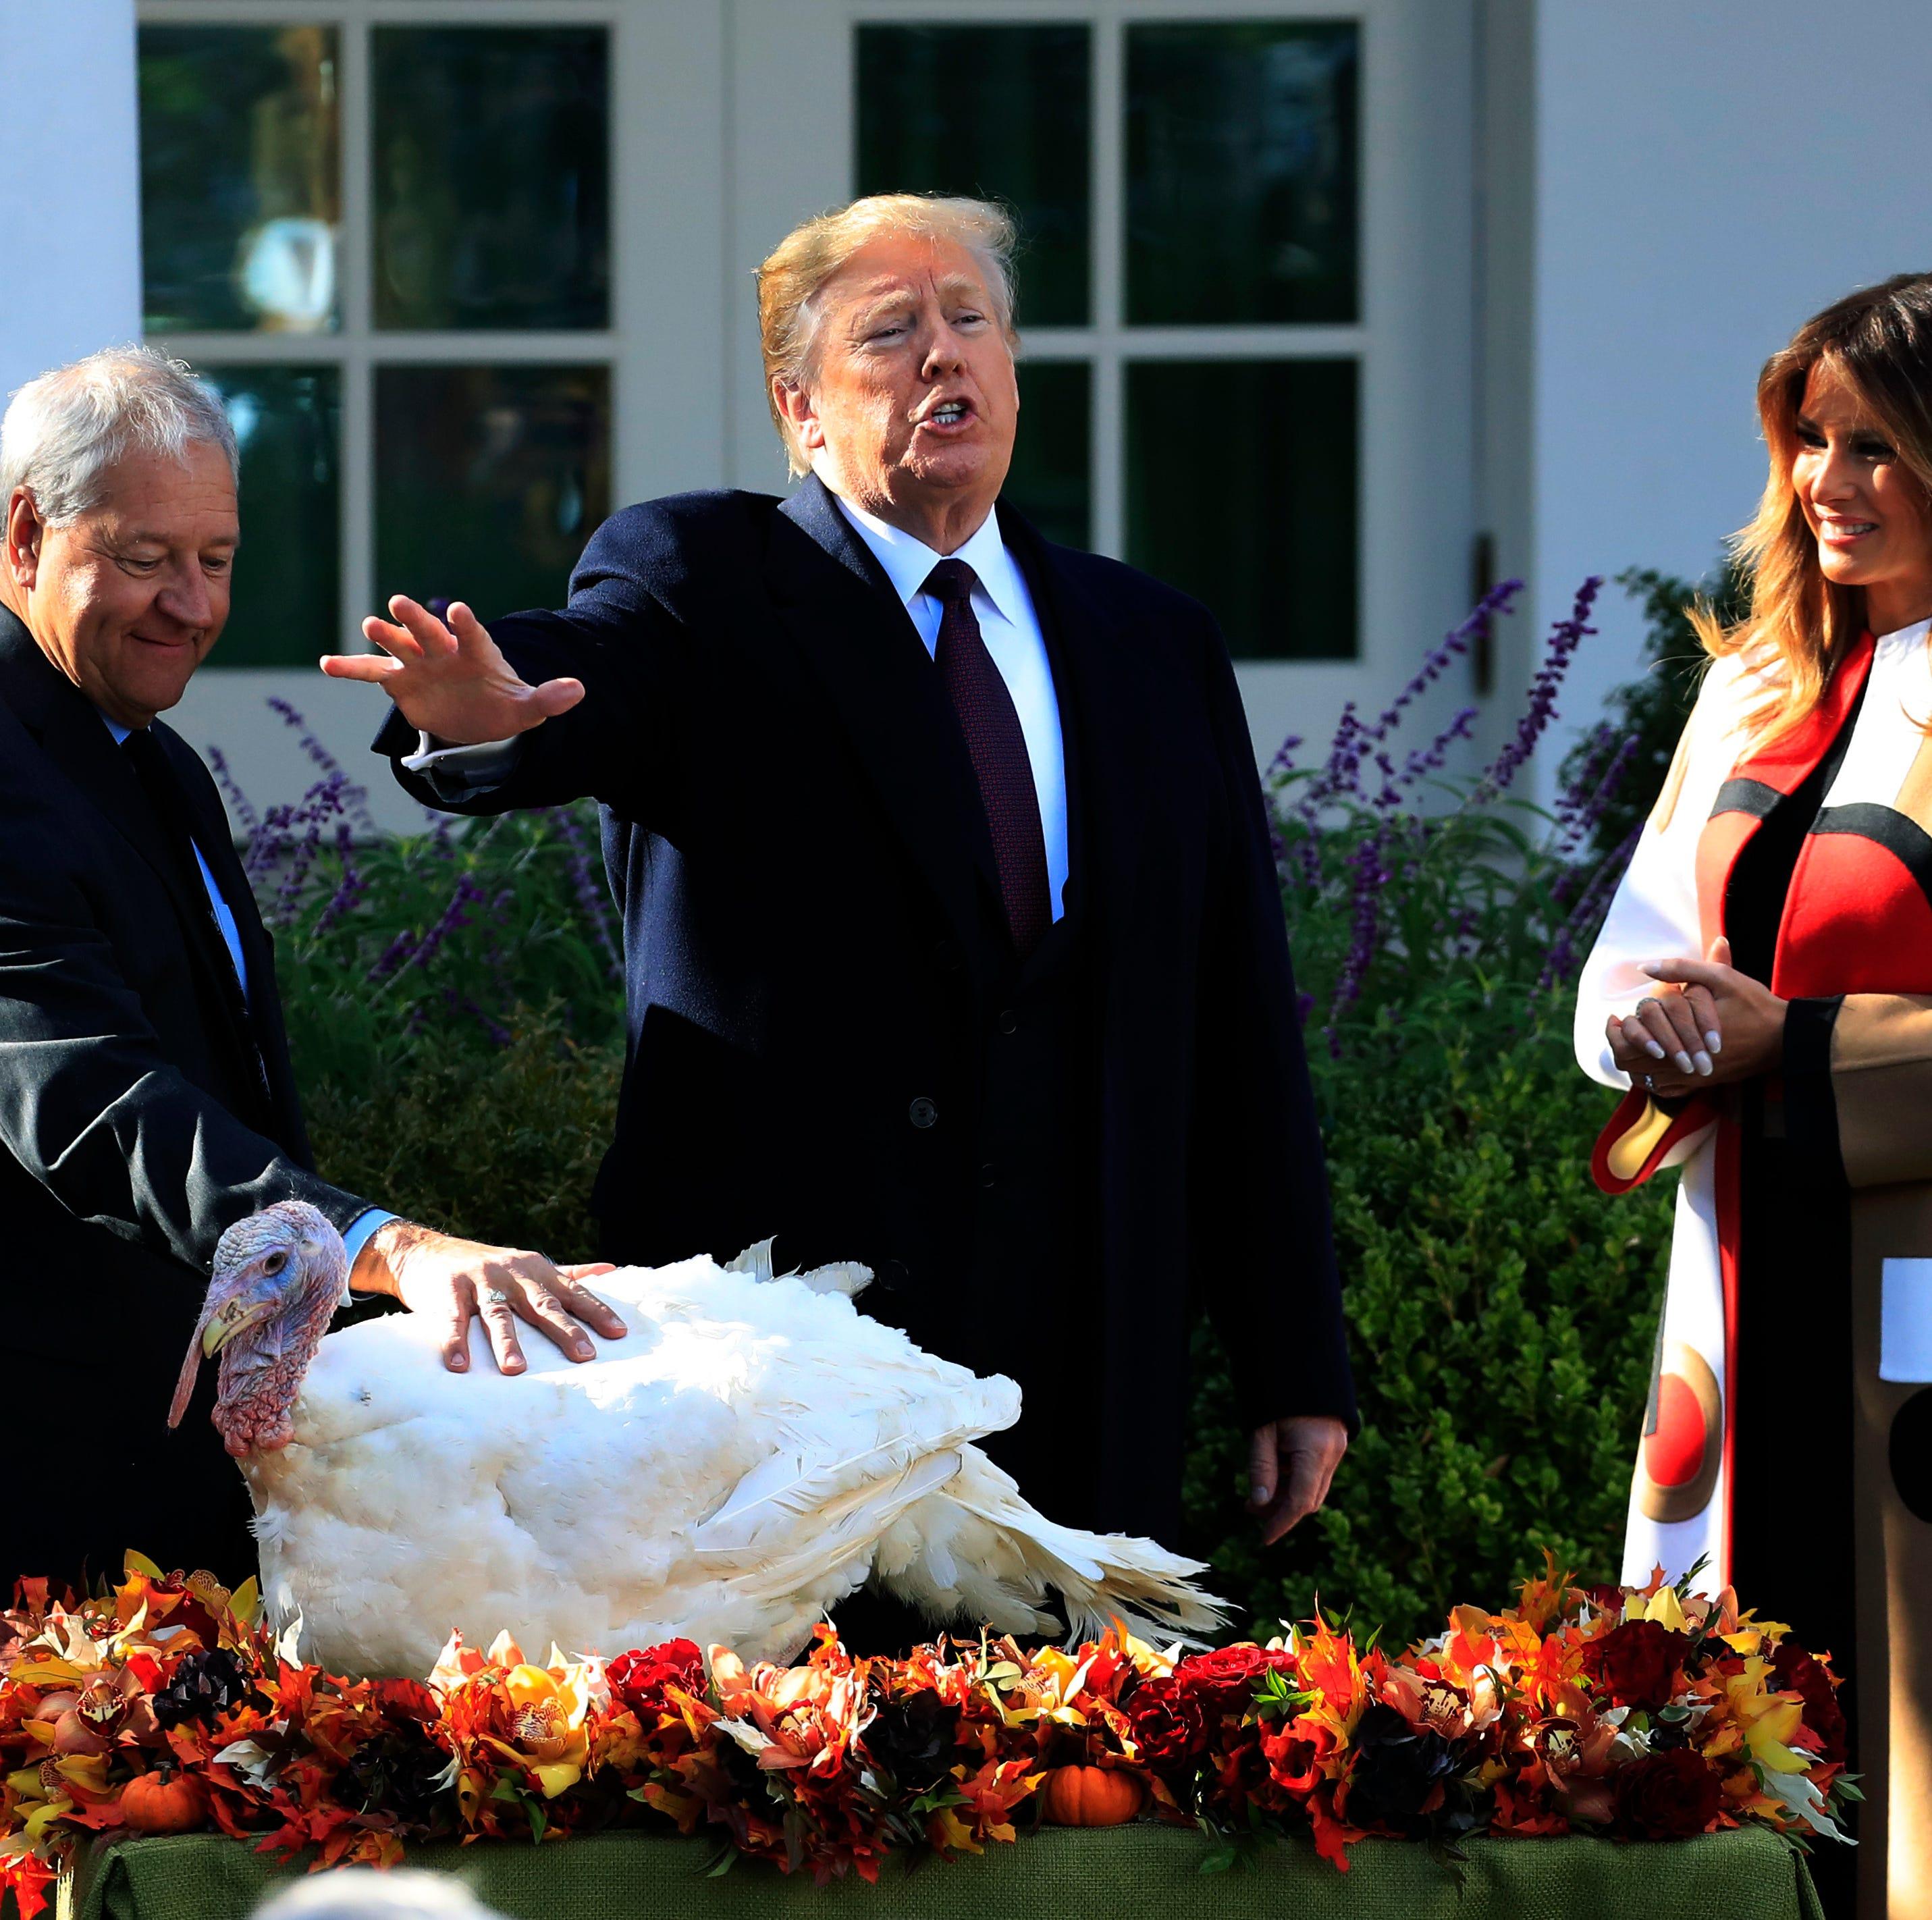 Trump's turkey pardon: South Dakota birds get spotlight at White House